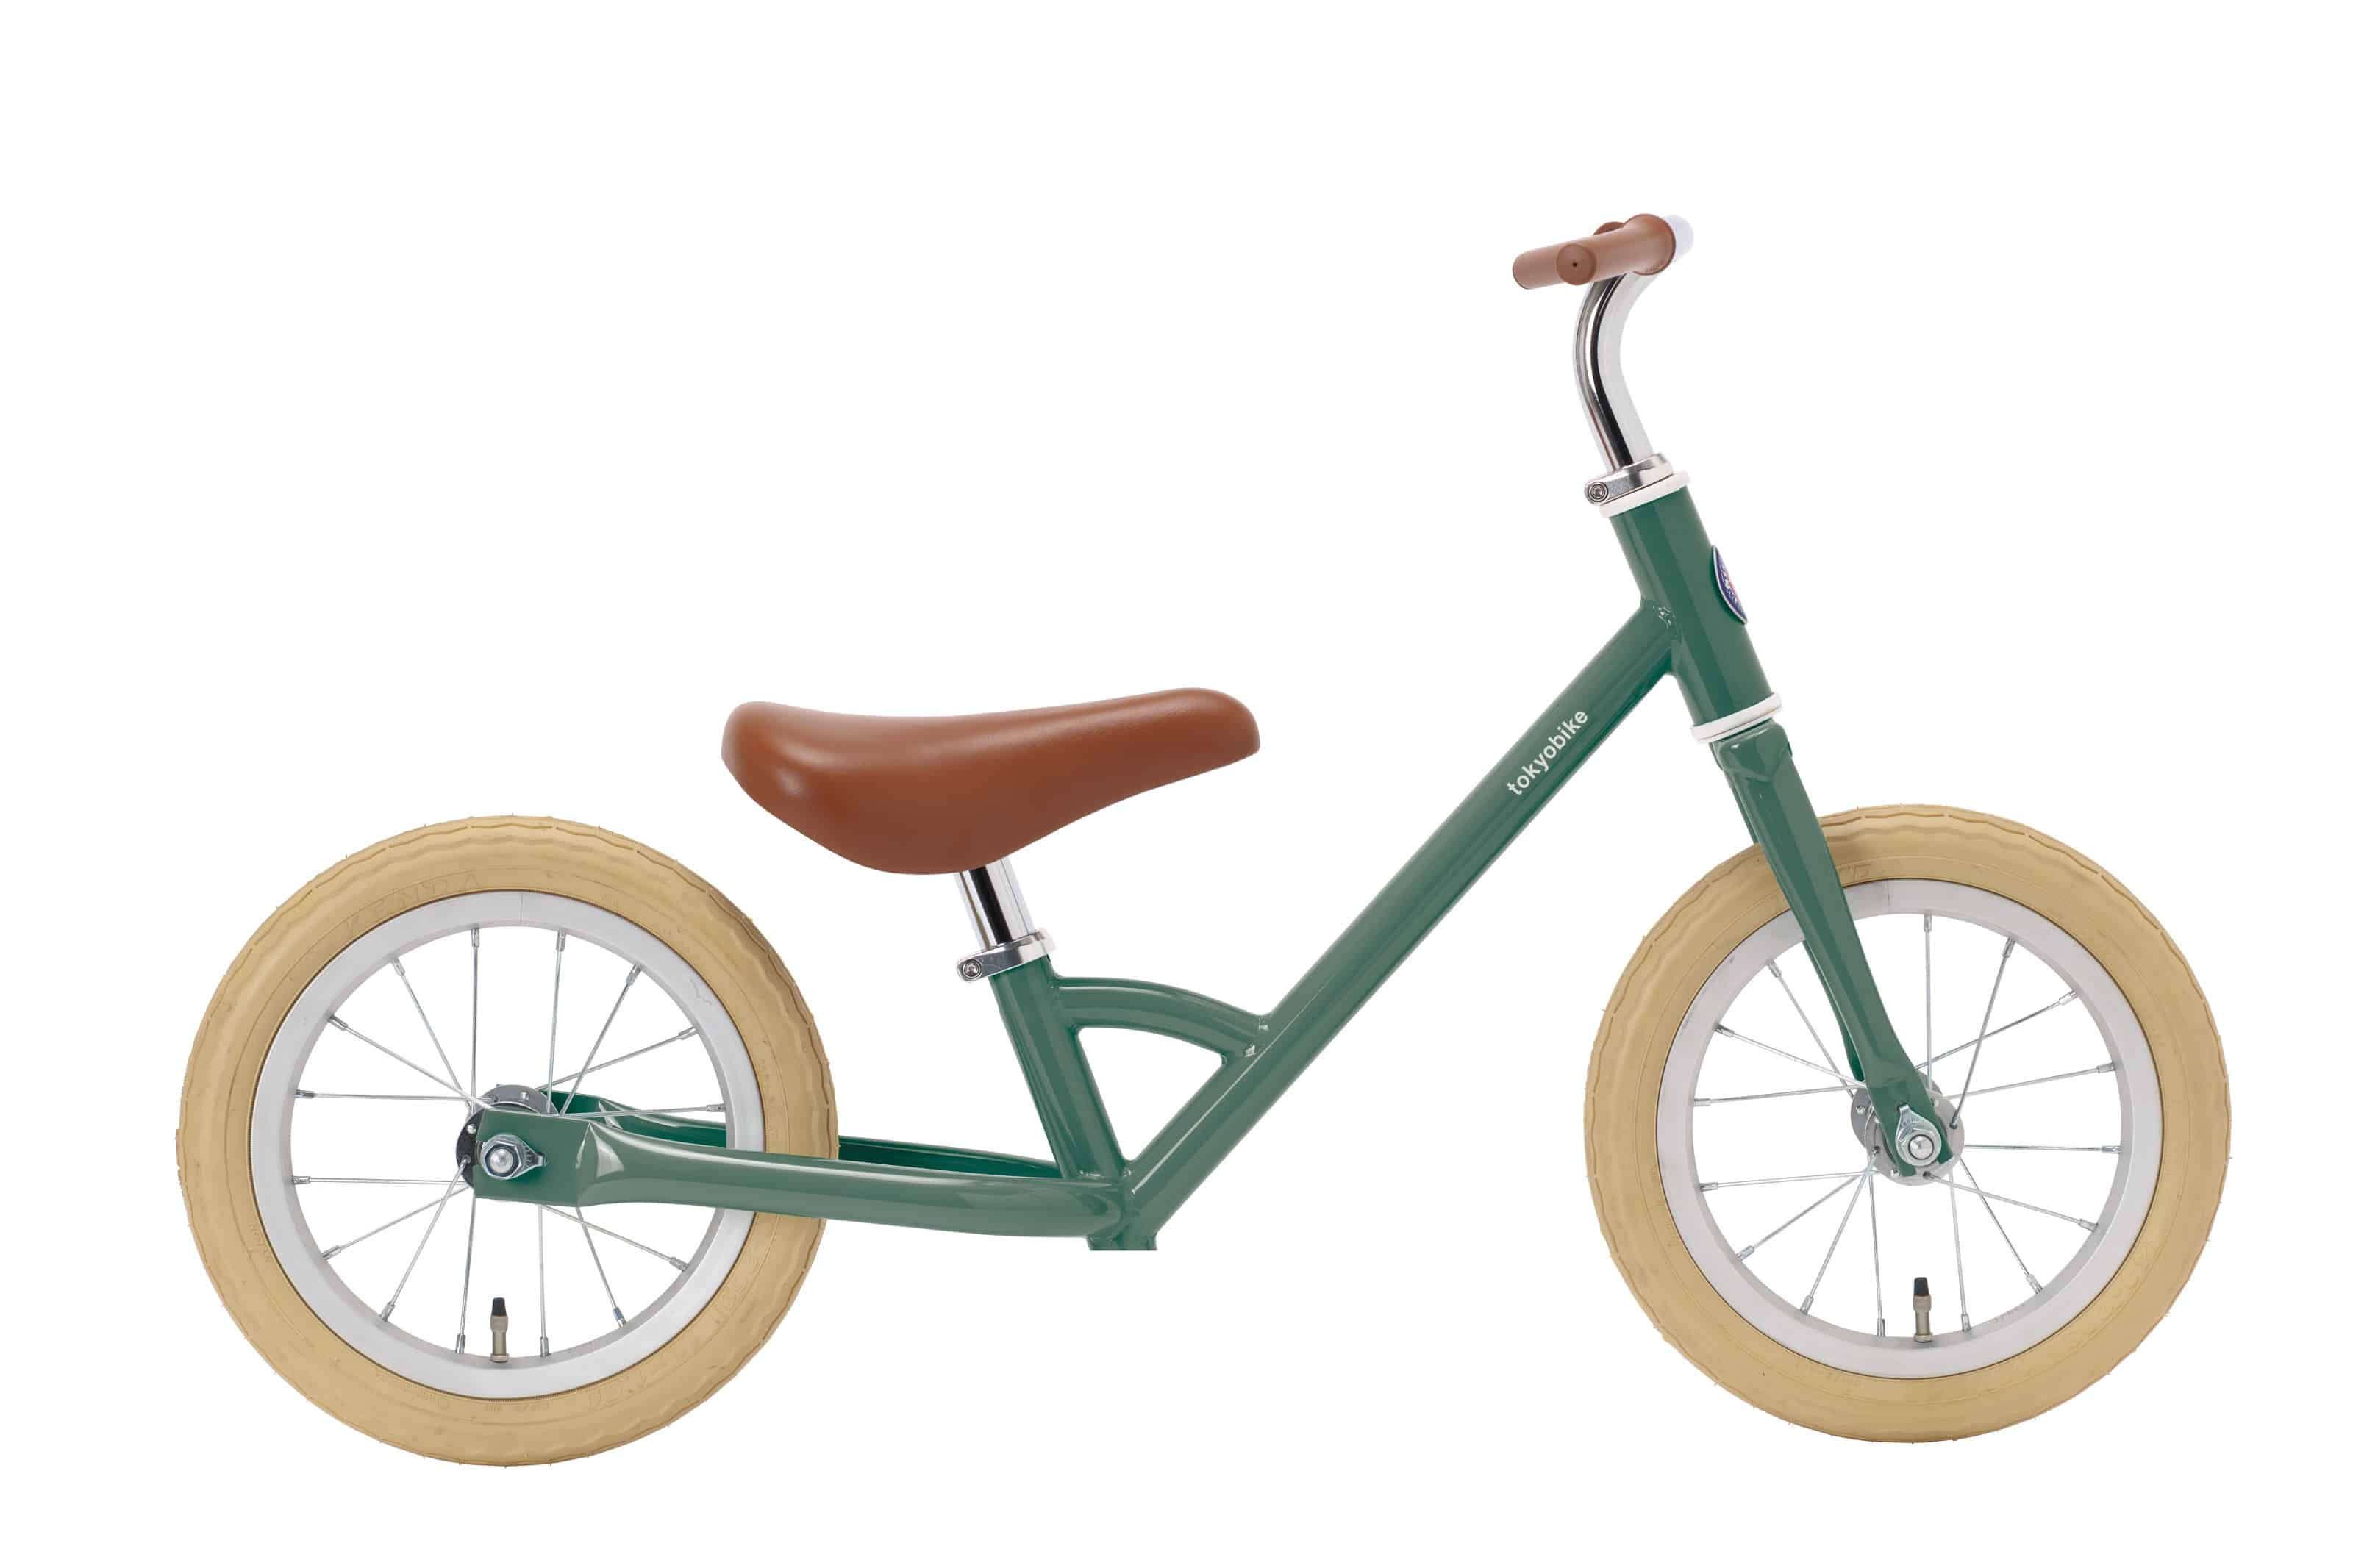 tokyobike paddle cedar green シダーグリーン